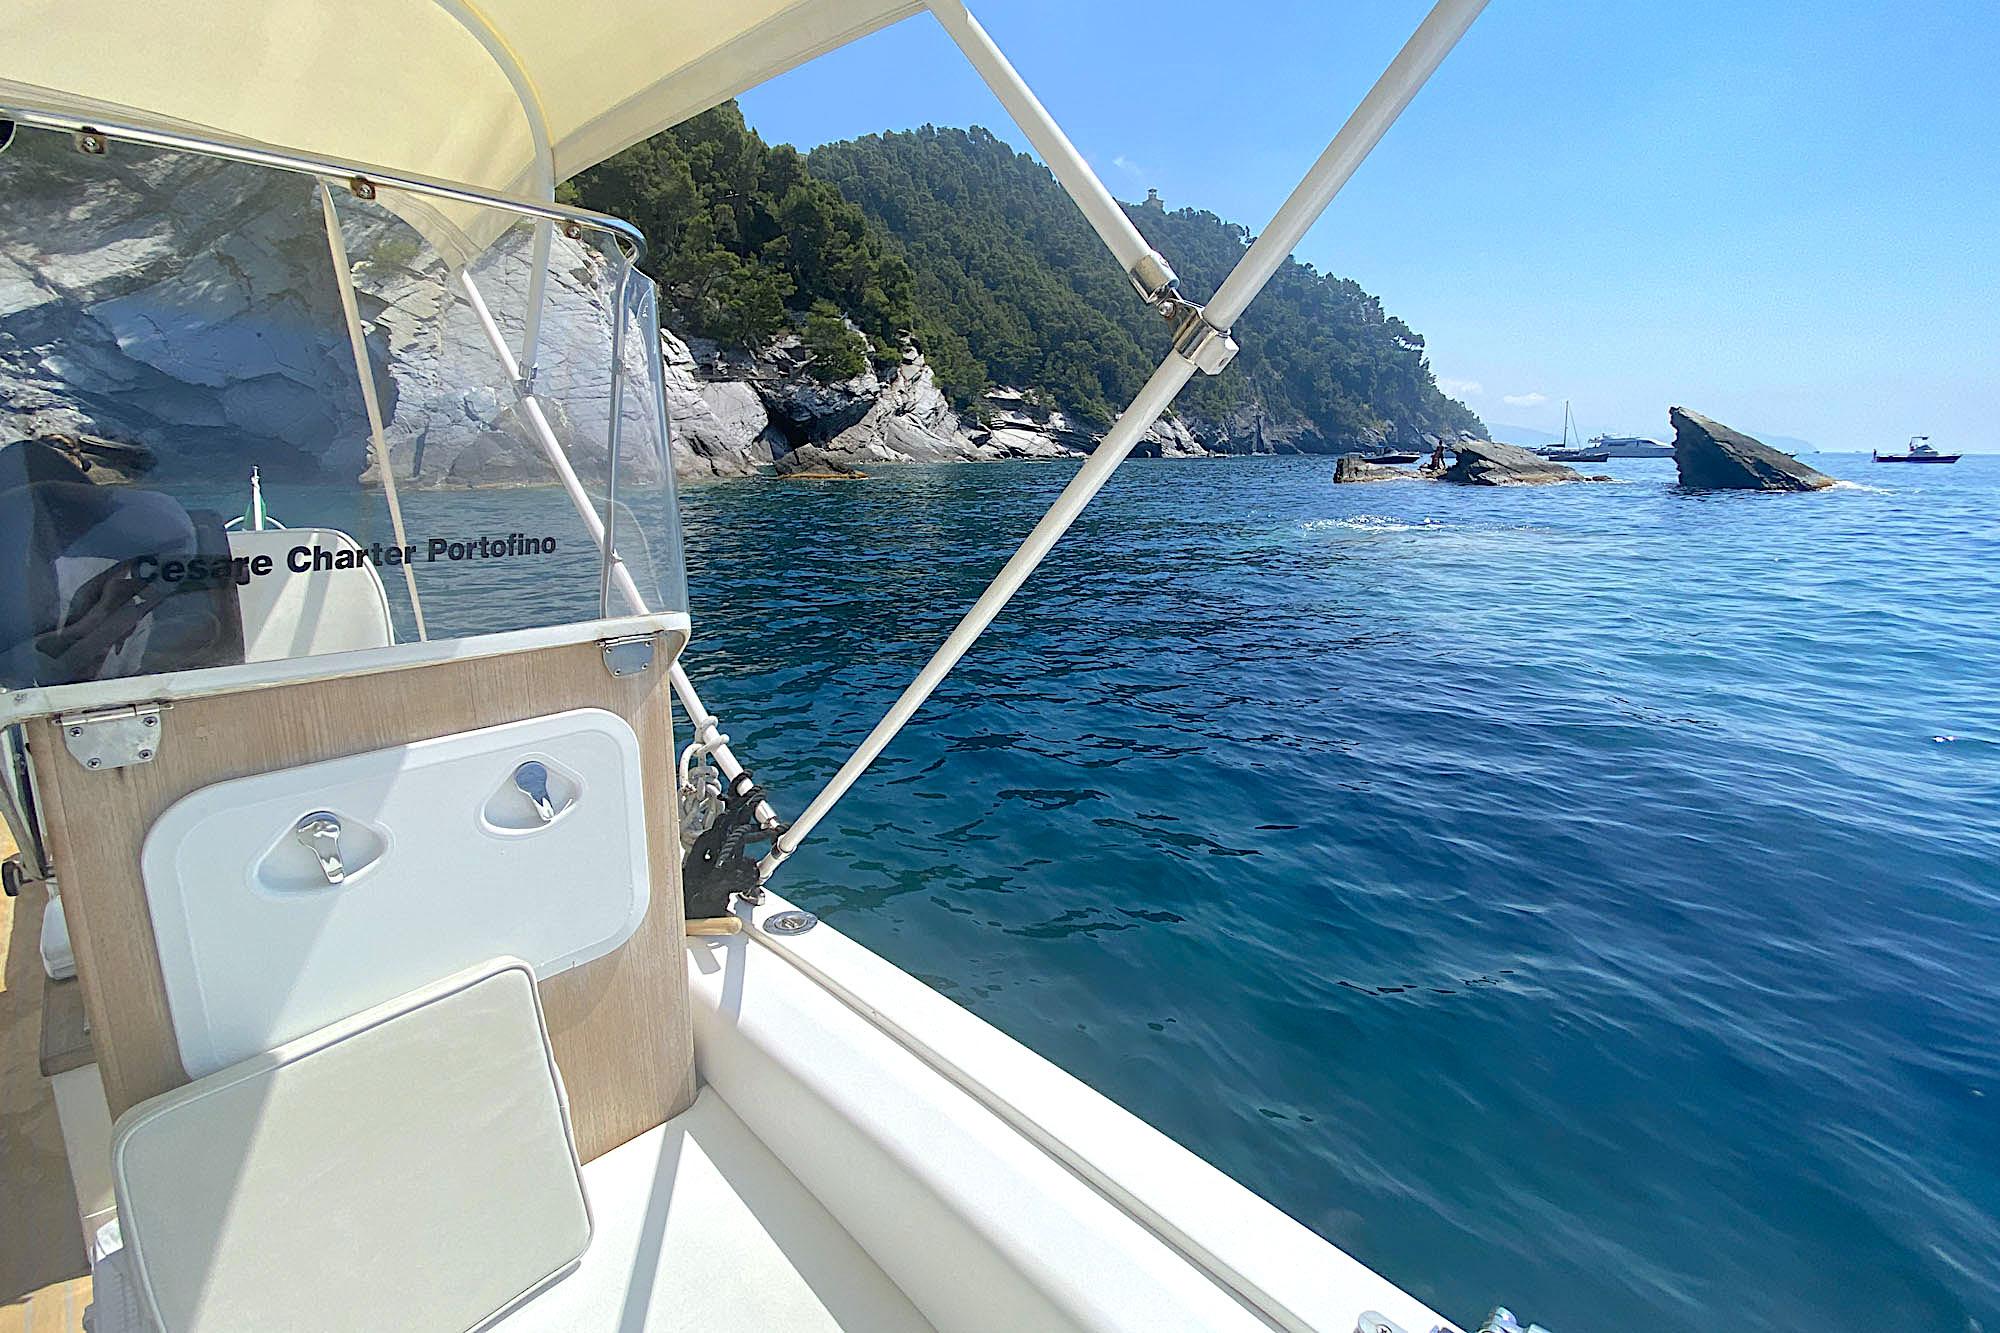 Cesare Charter Portofino - Tour Porto Venere and Palmaria Island,swim and snorkeling